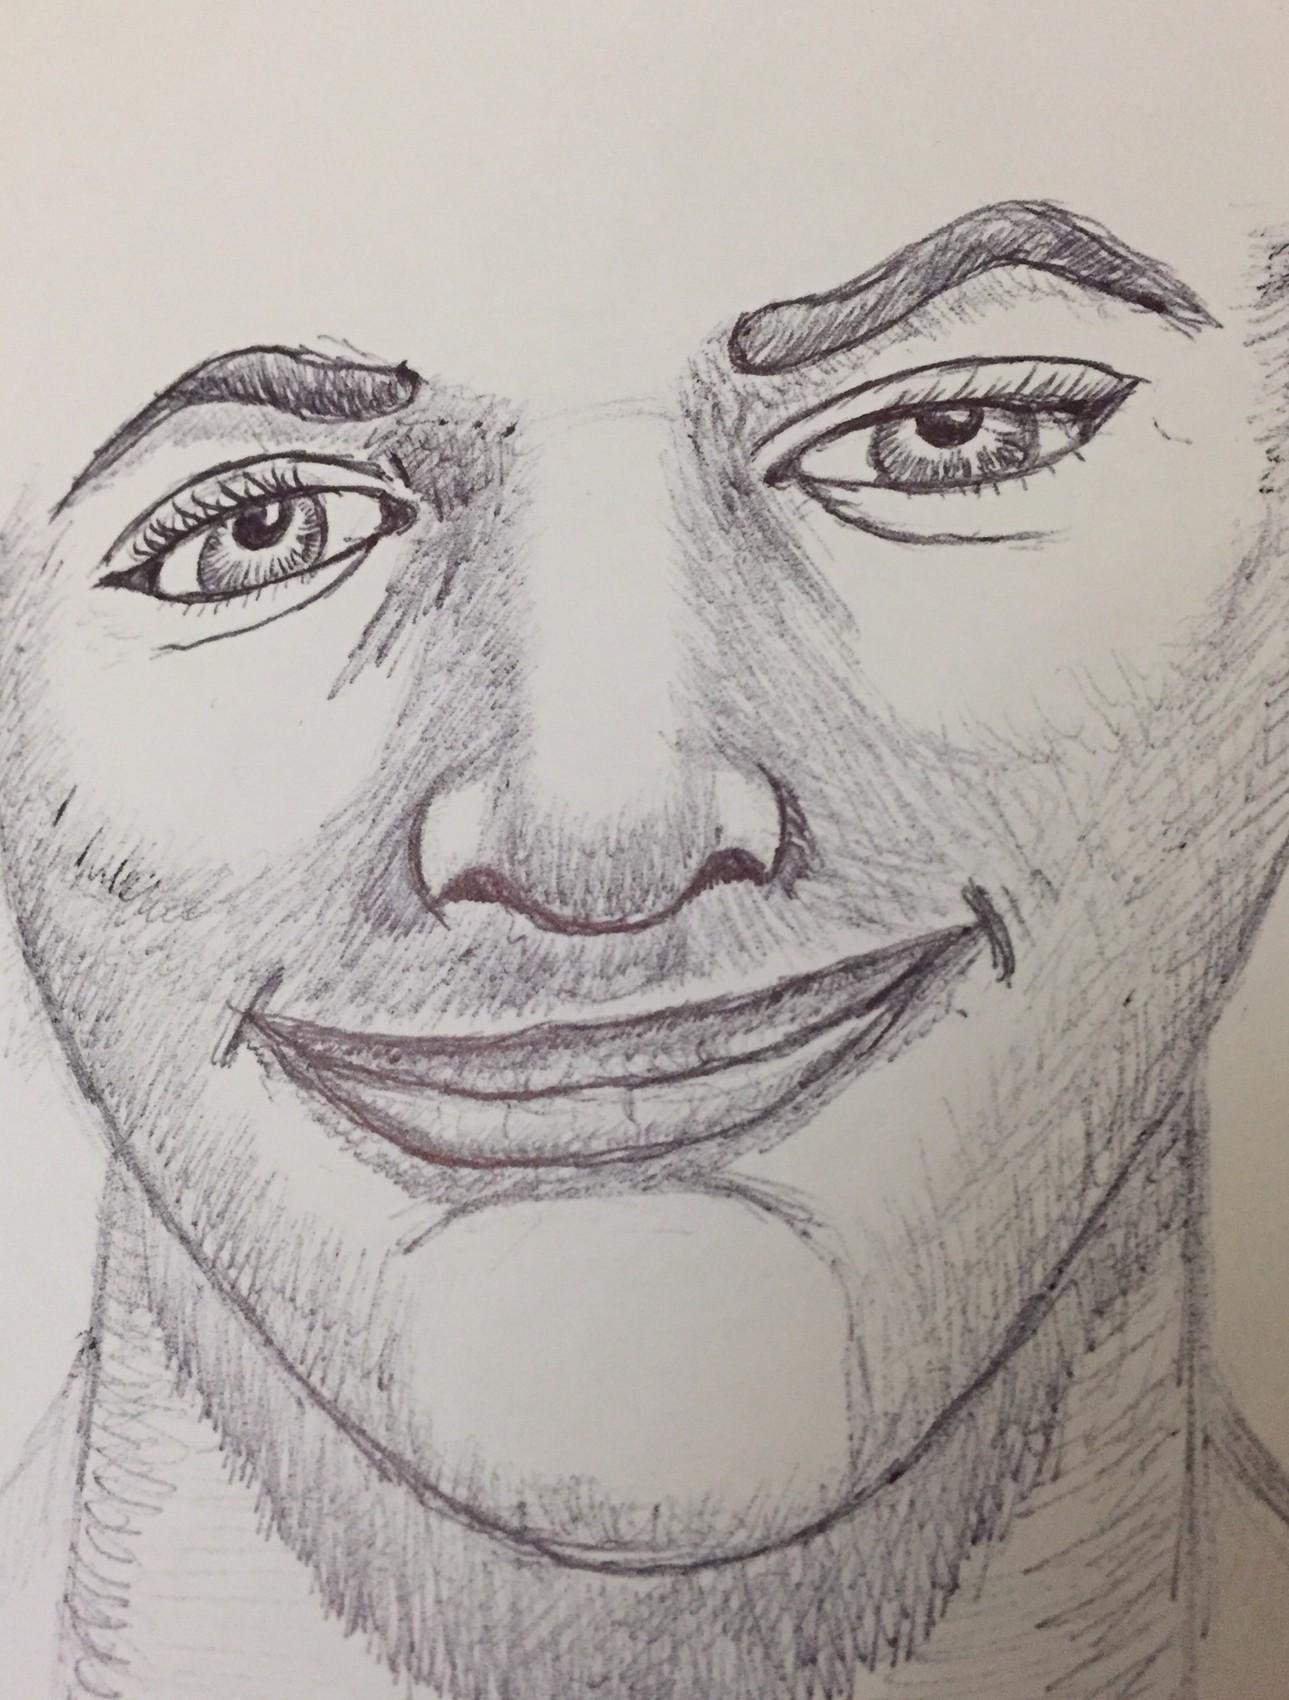 Ink pen face